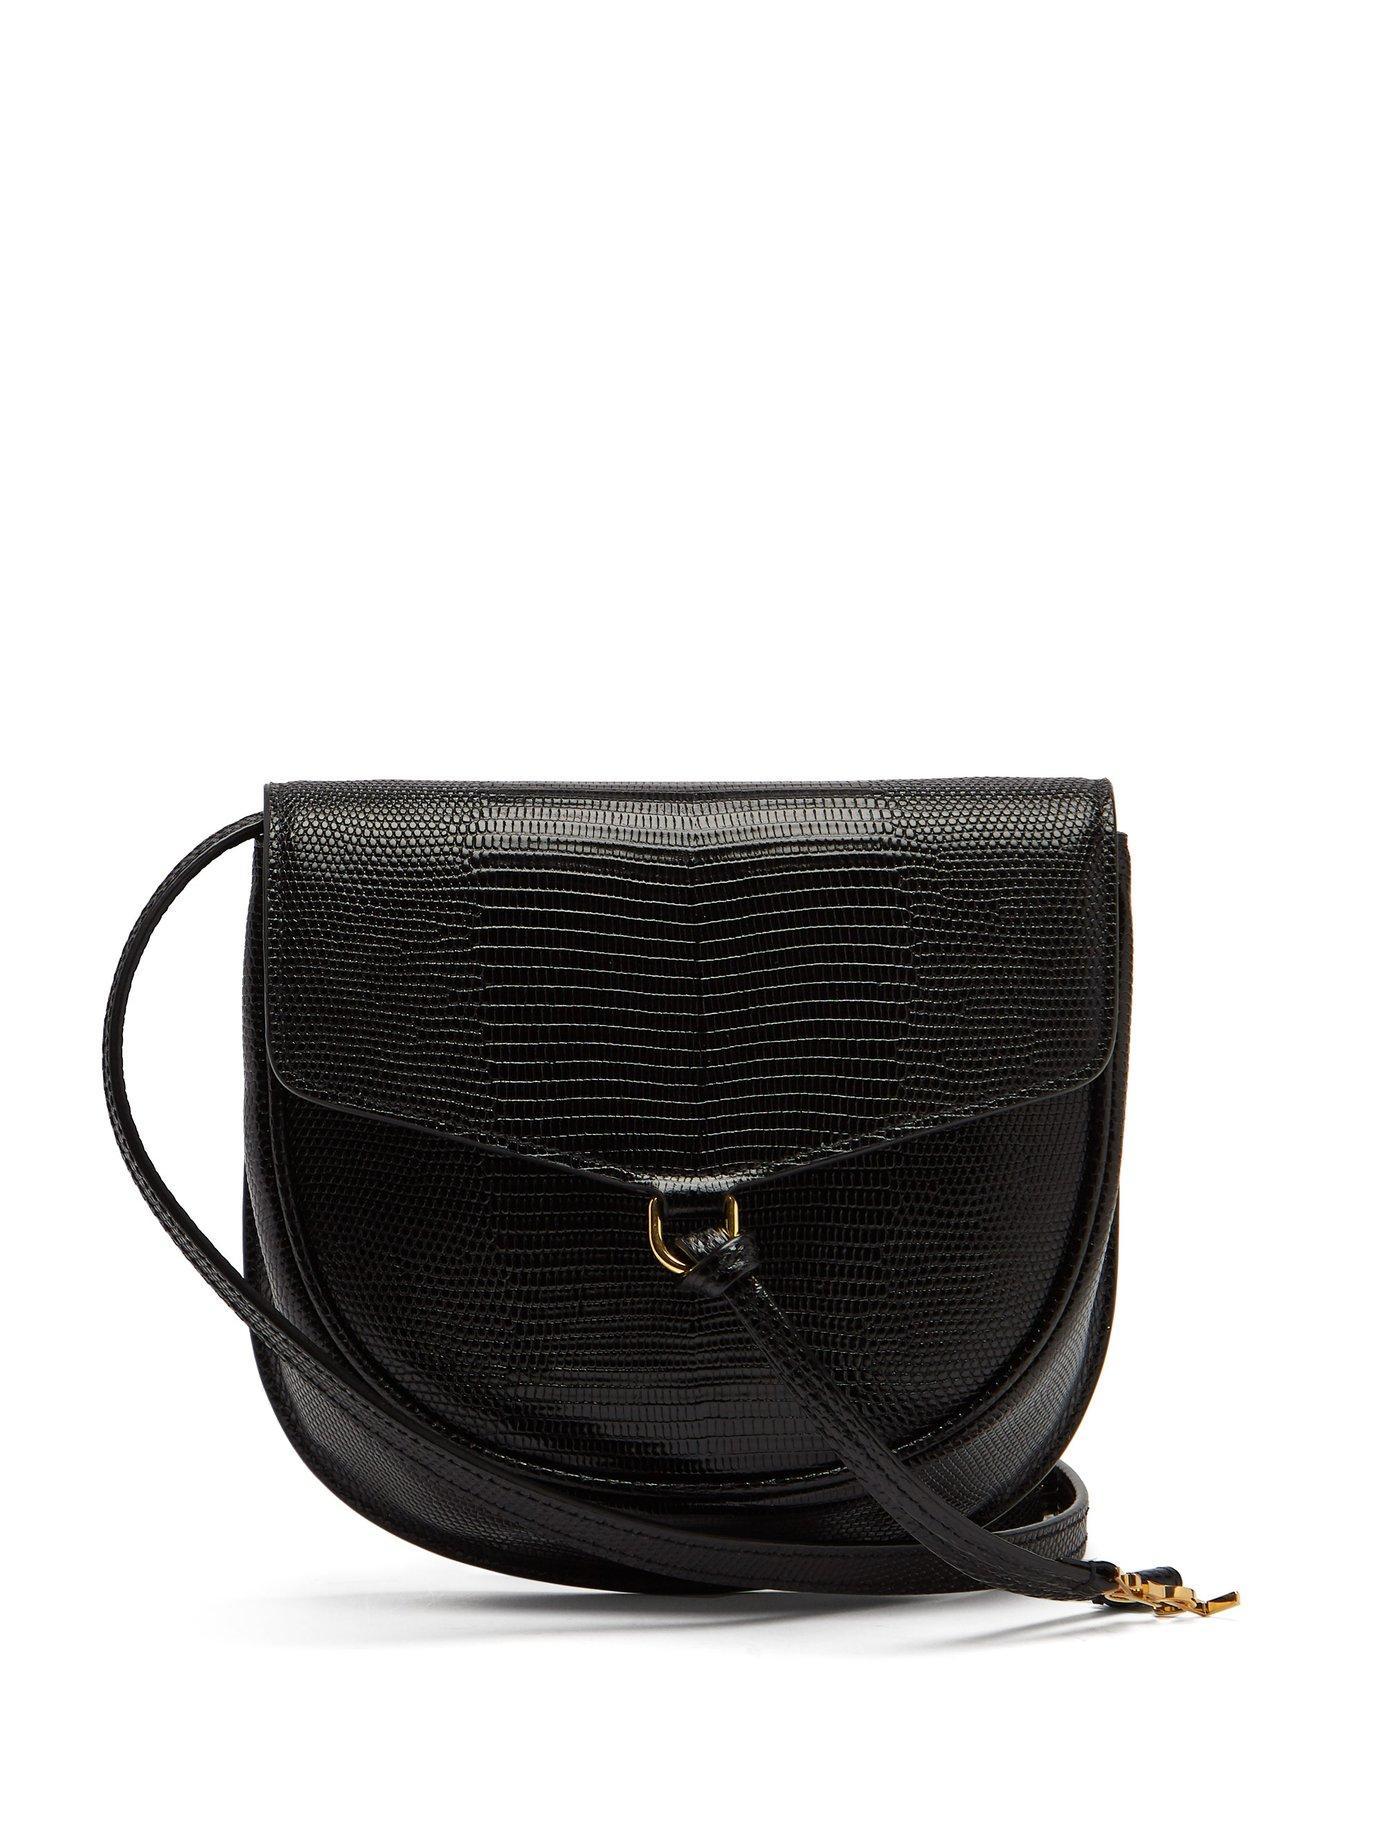 830073b3c1af Saint Laurent. Women s Black Datcha Lizard Effect Leather Cross Body Bag